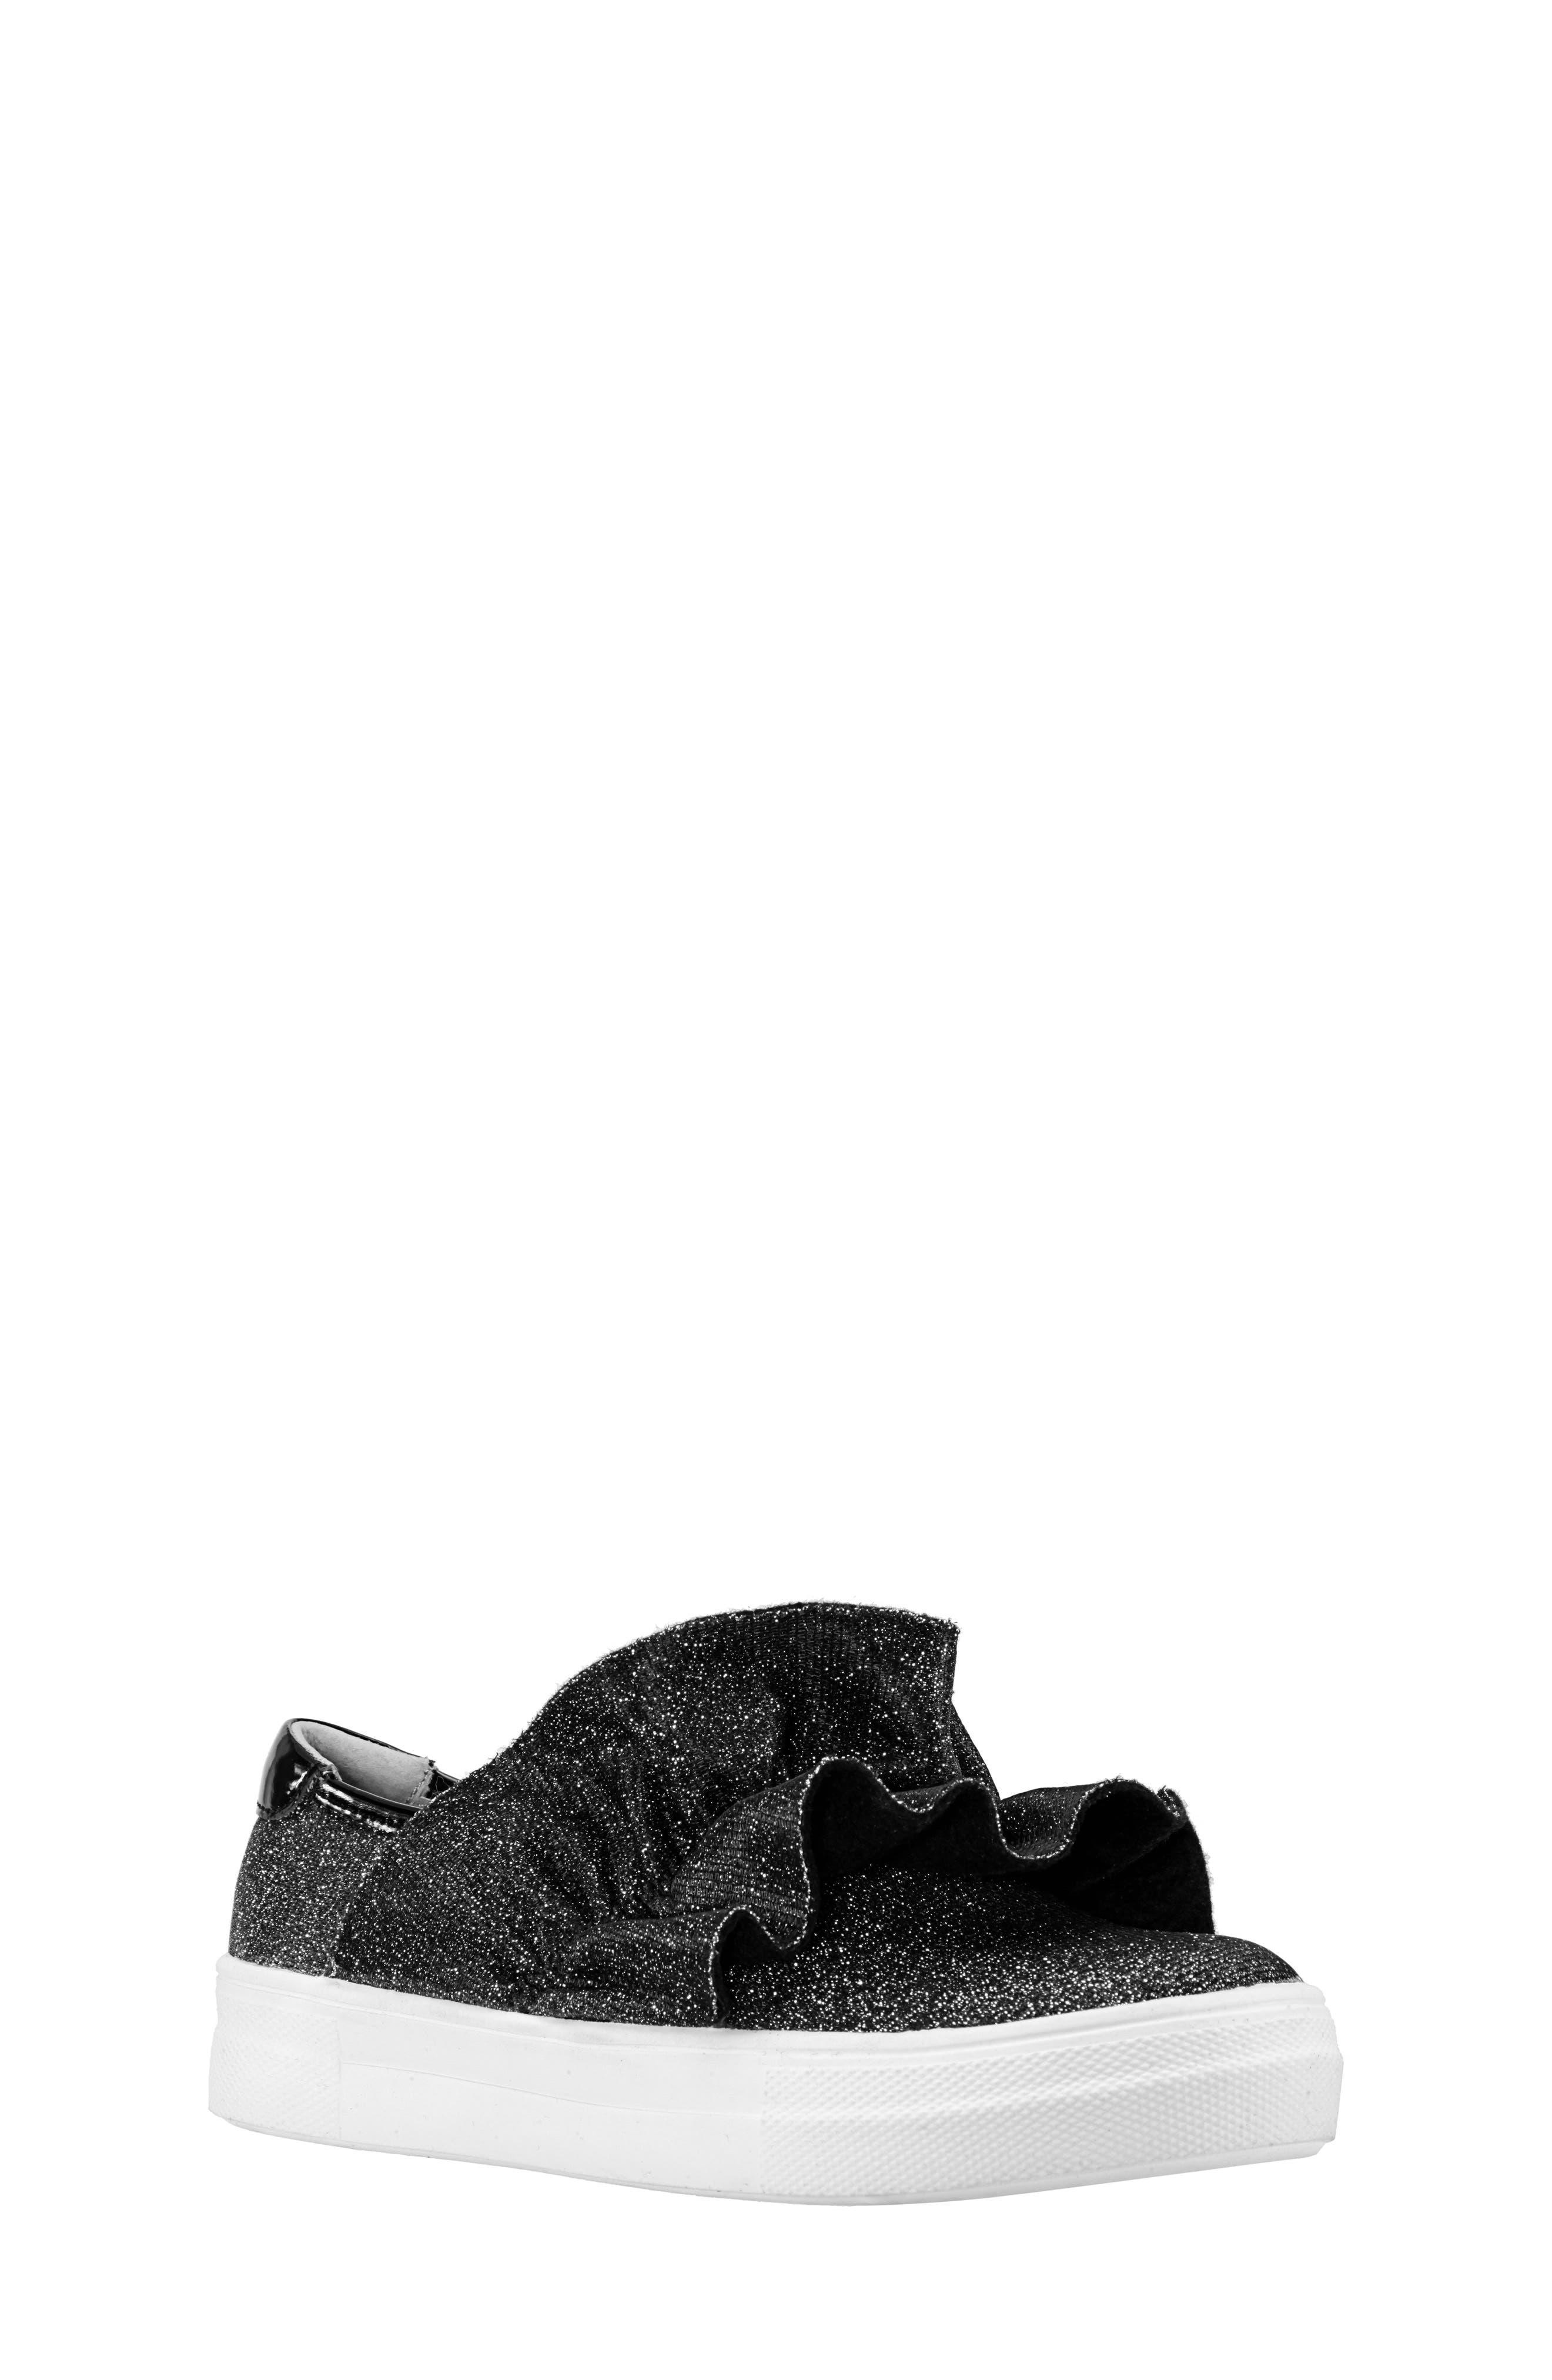 Ivani Slip-On Sneaker,                         Main,                         color, BLACK SPARKLE FABRIC